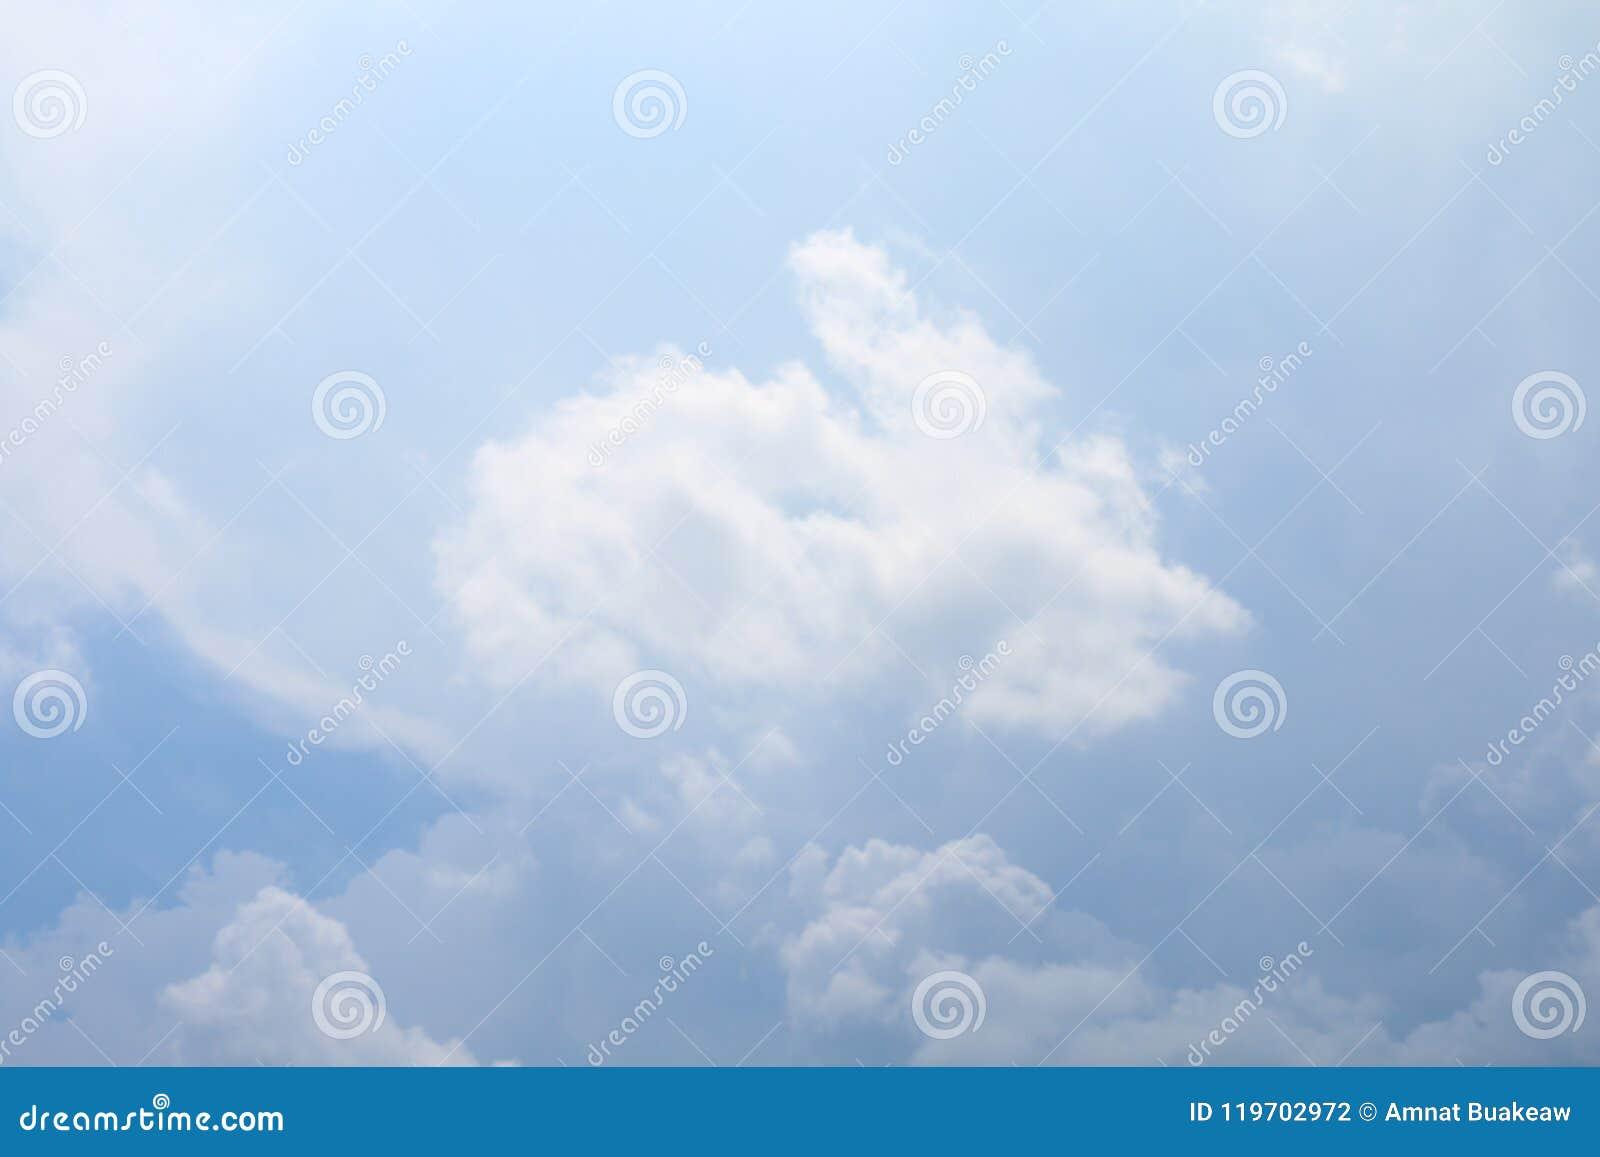 Sky, sky with fluffy clouds big, sky blue cloud background, cloudscape sky clear